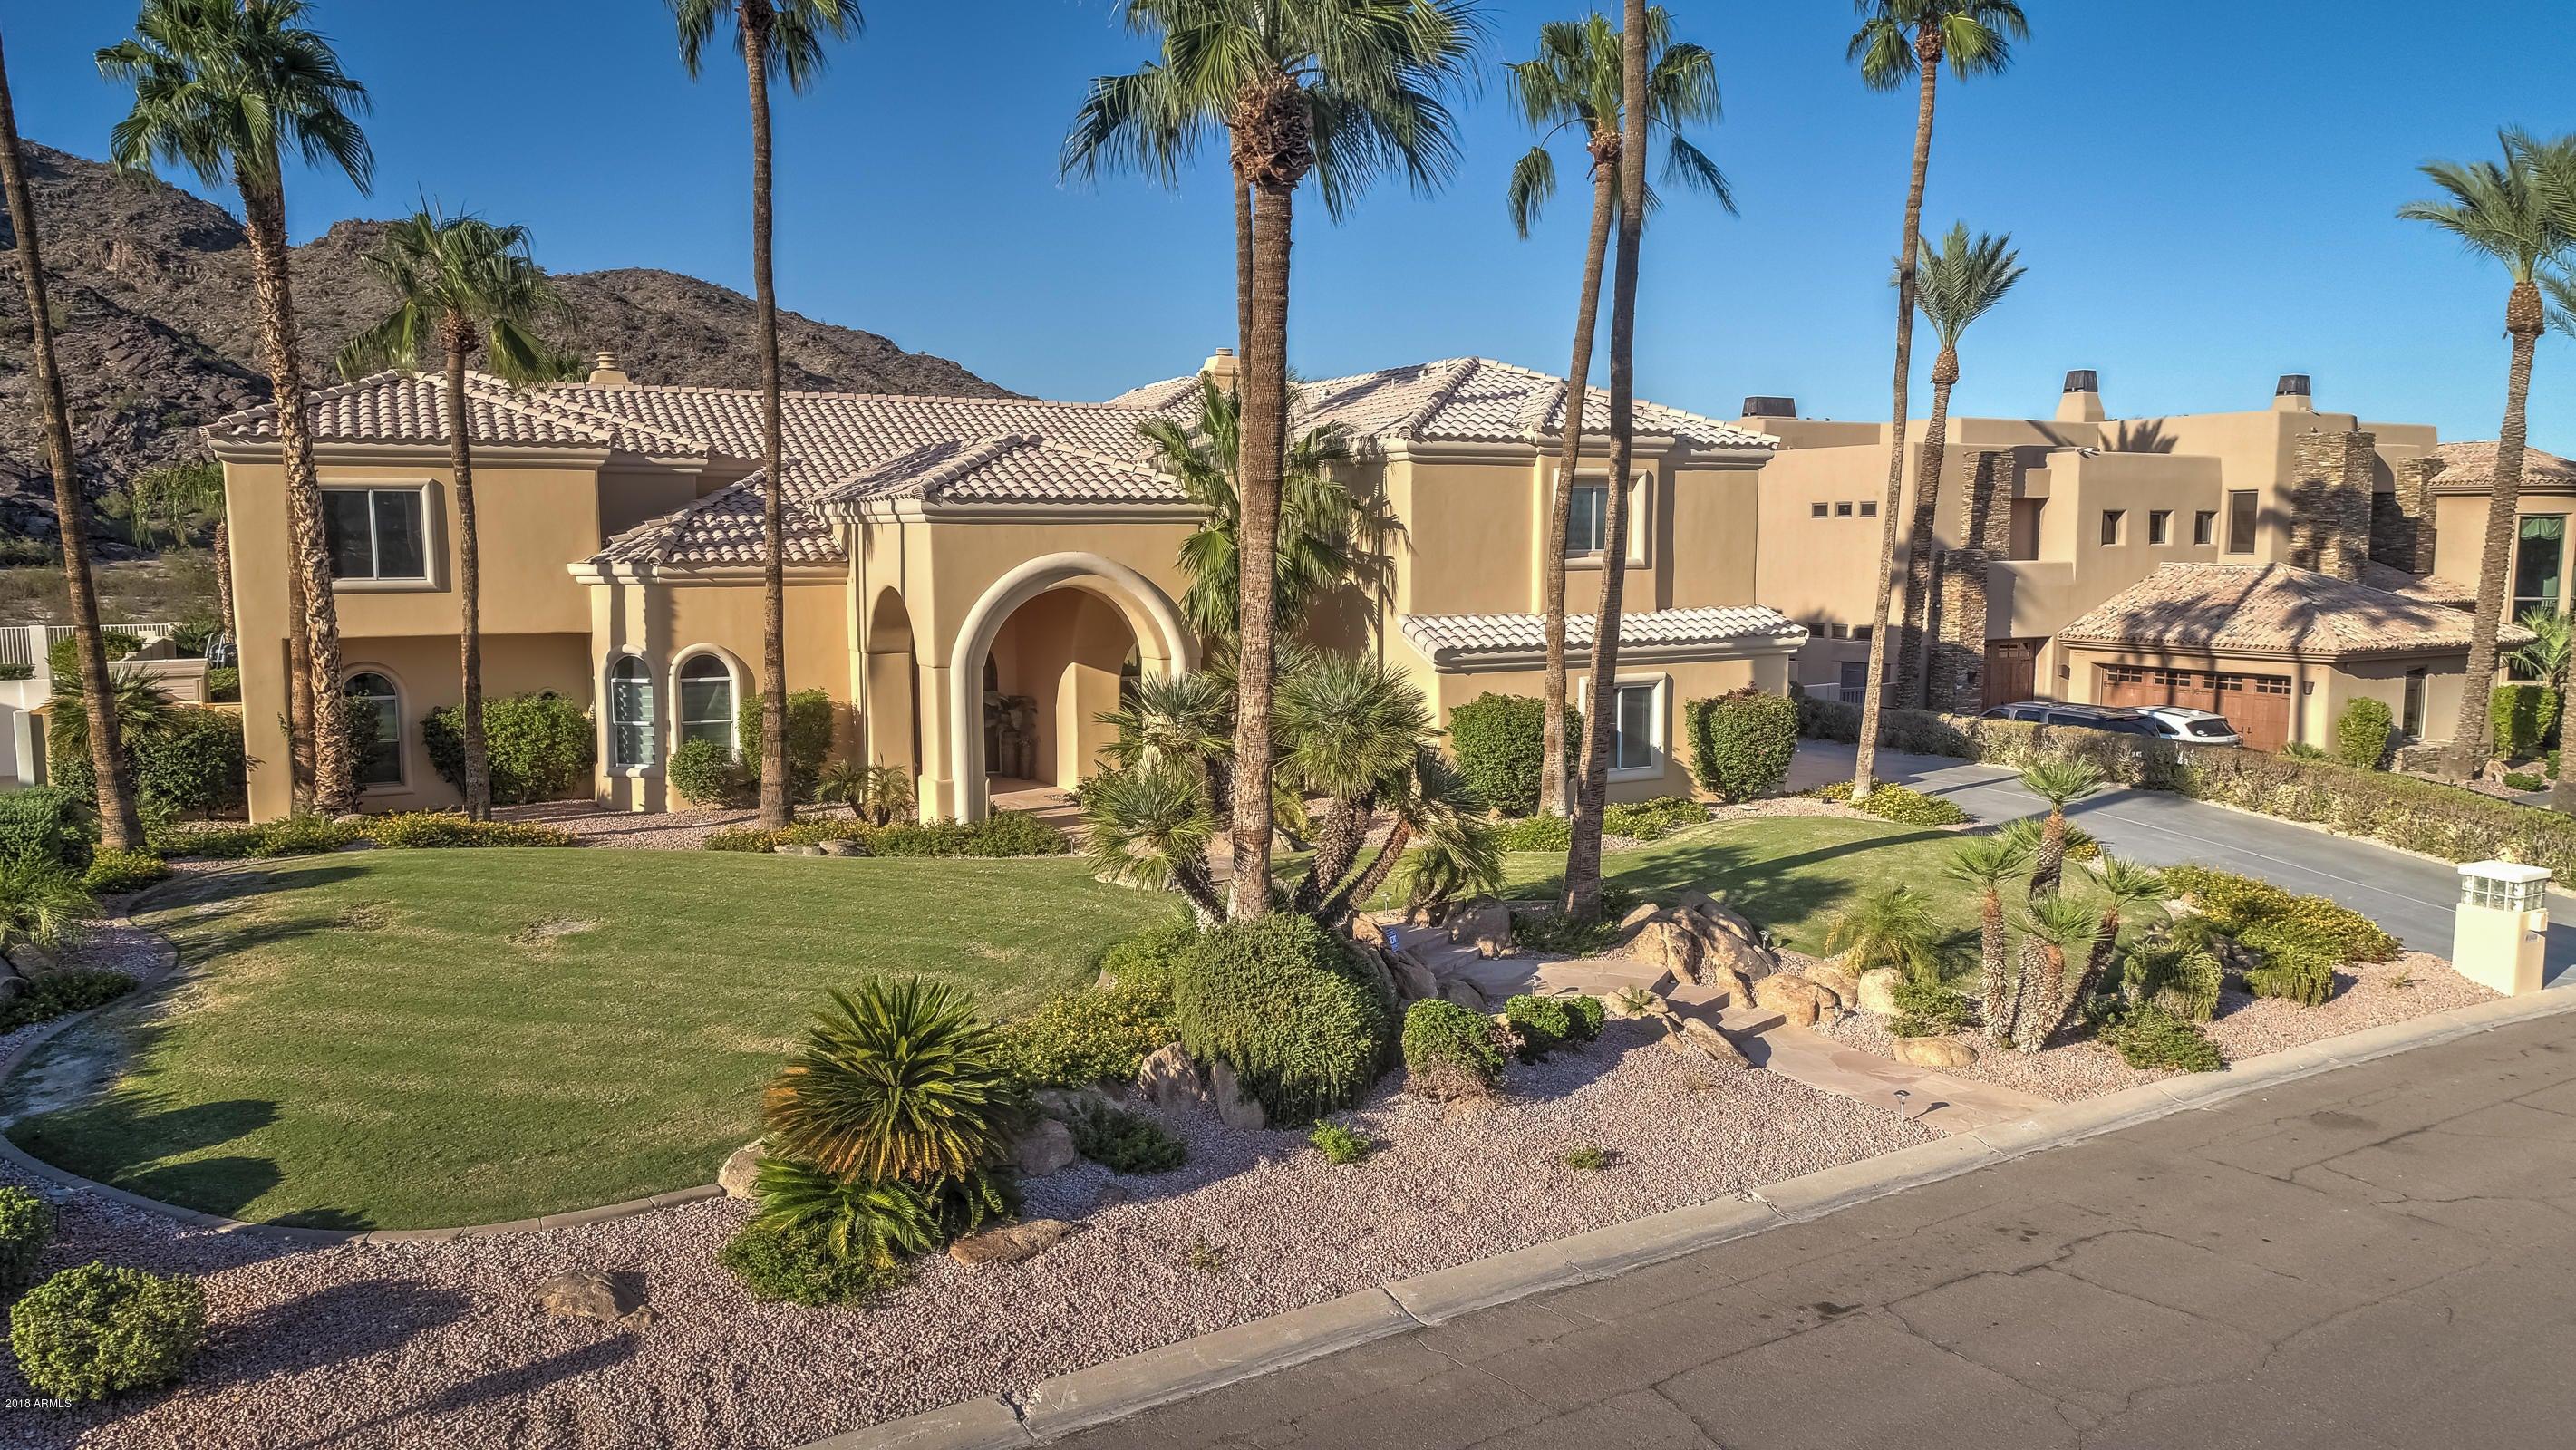 MLS 5826973 3430 E KACHINA Drive, Phoenix, AZ 85044 Ahwatukee Community AZ Luxury